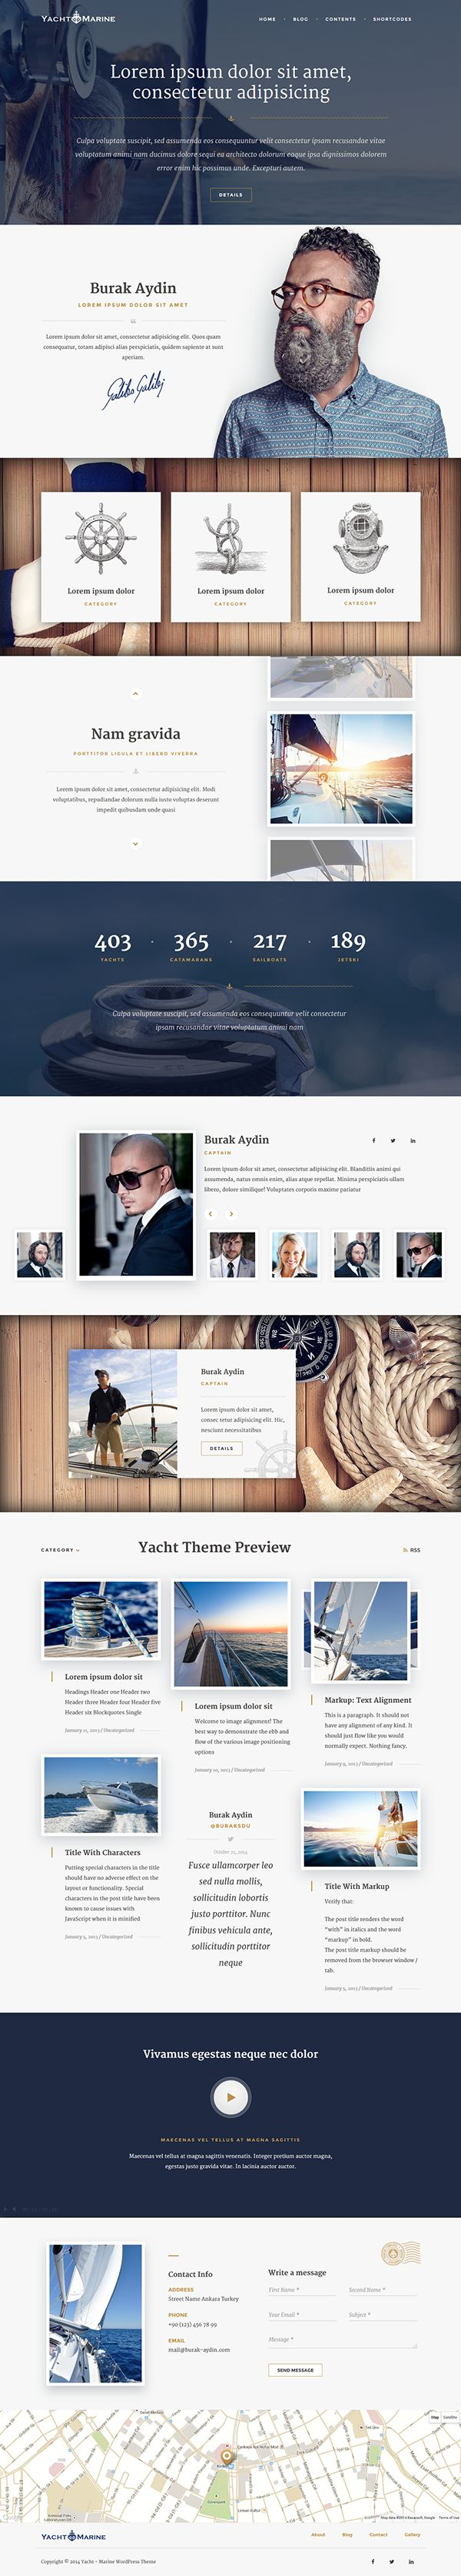 Yacht - Marine WordPress Theme UI/UX, Web Design, Web Development